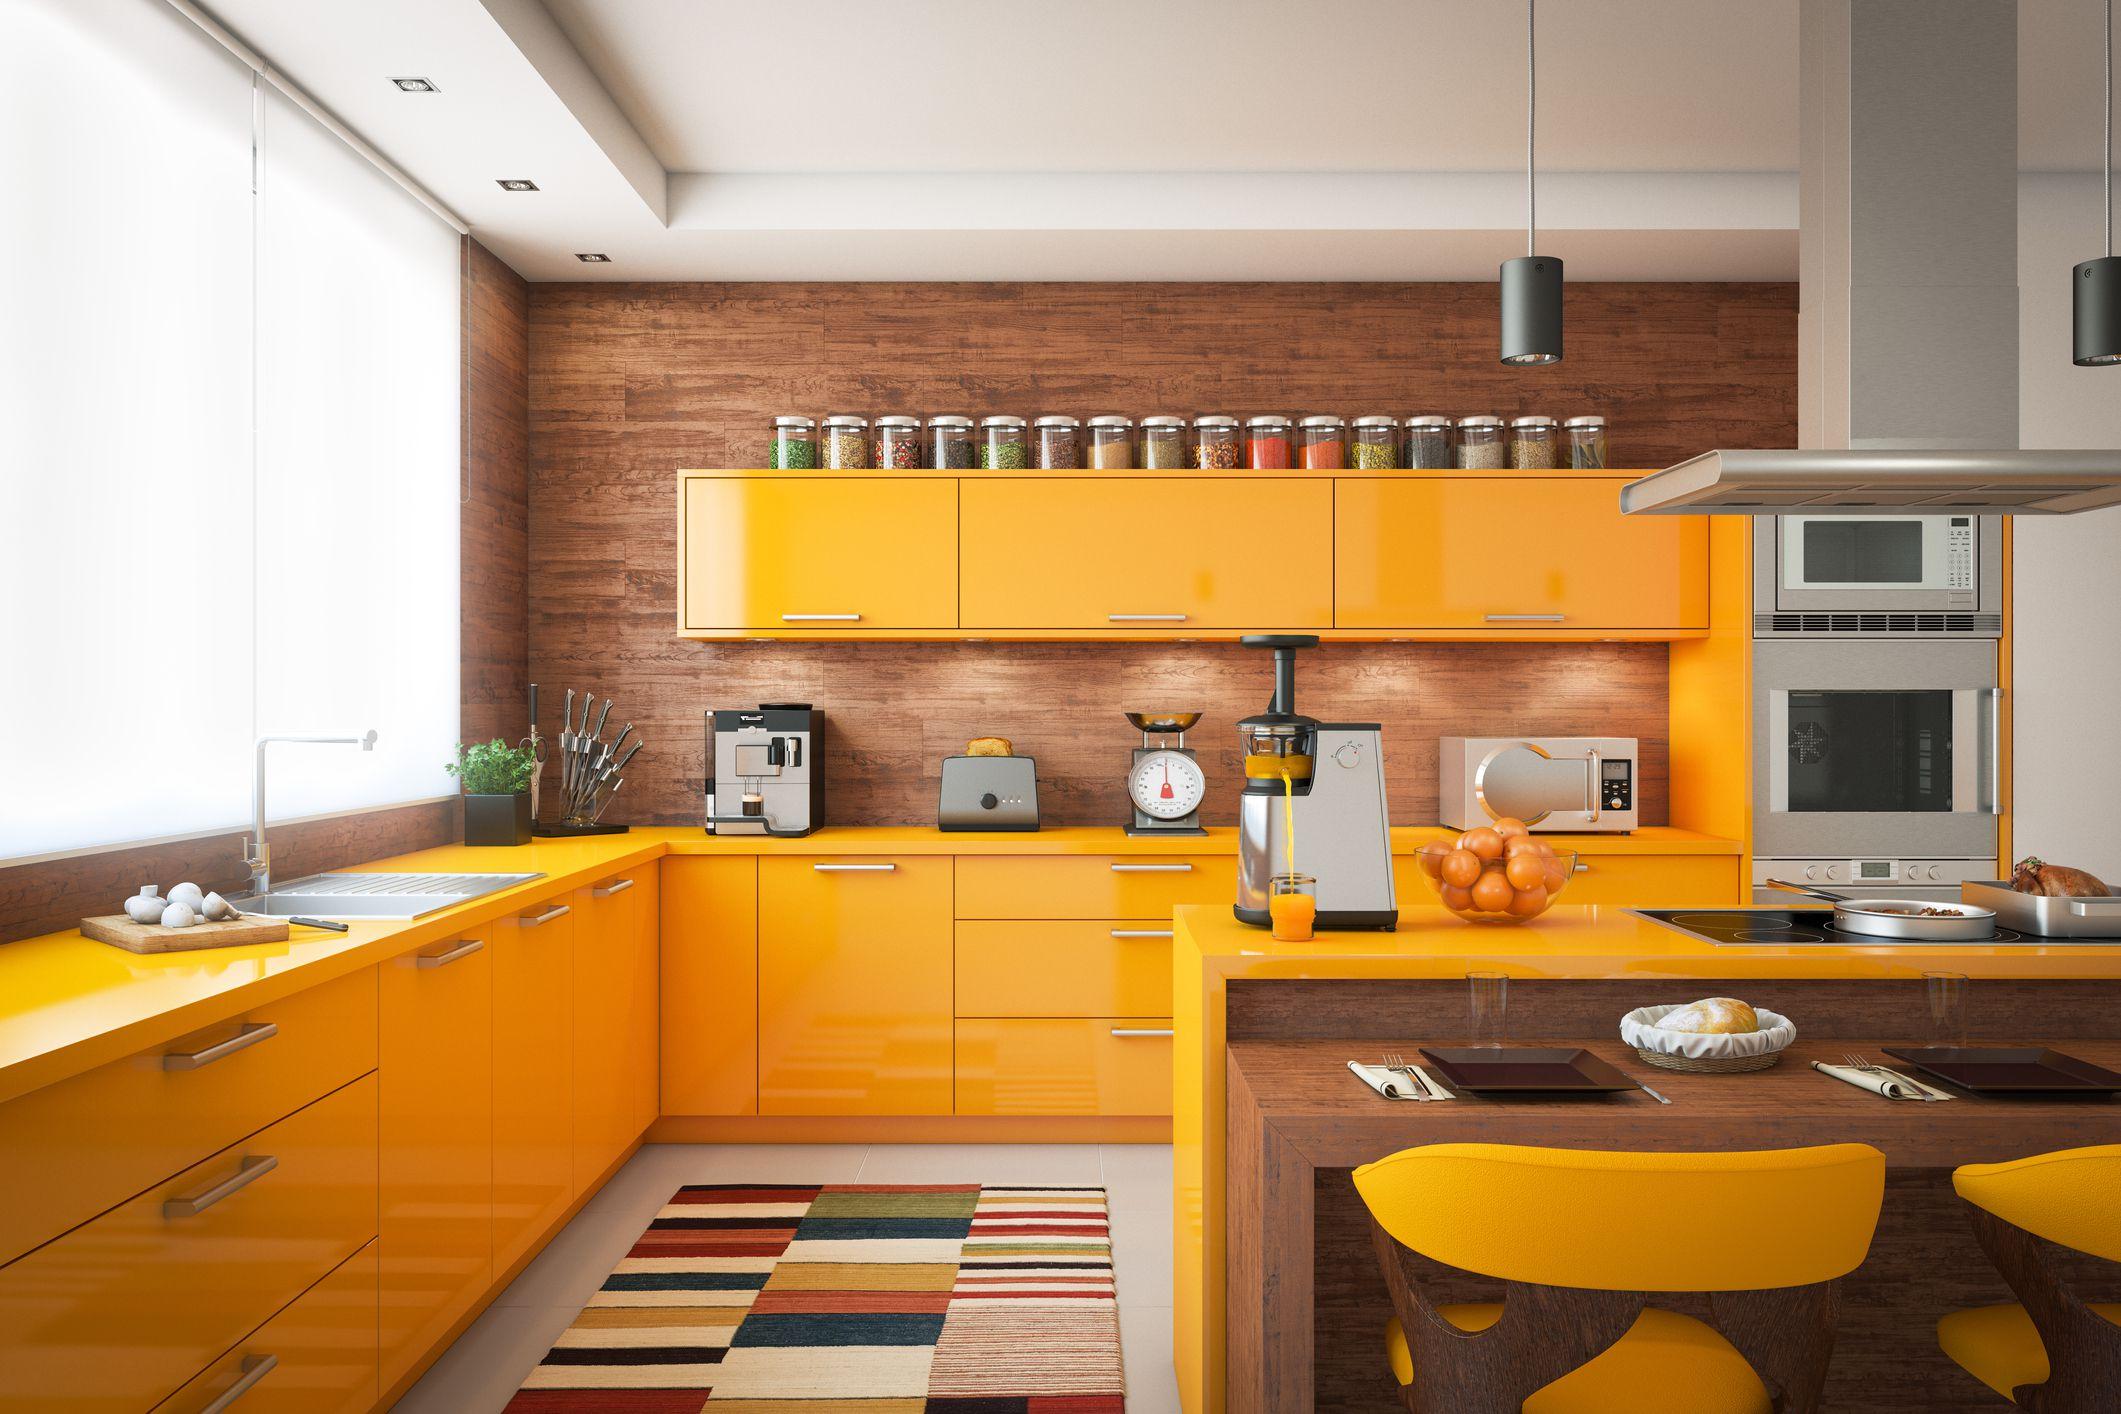 White Kitchen Brick Backsplash Unique Diy Kitchen Backsplash Ideas